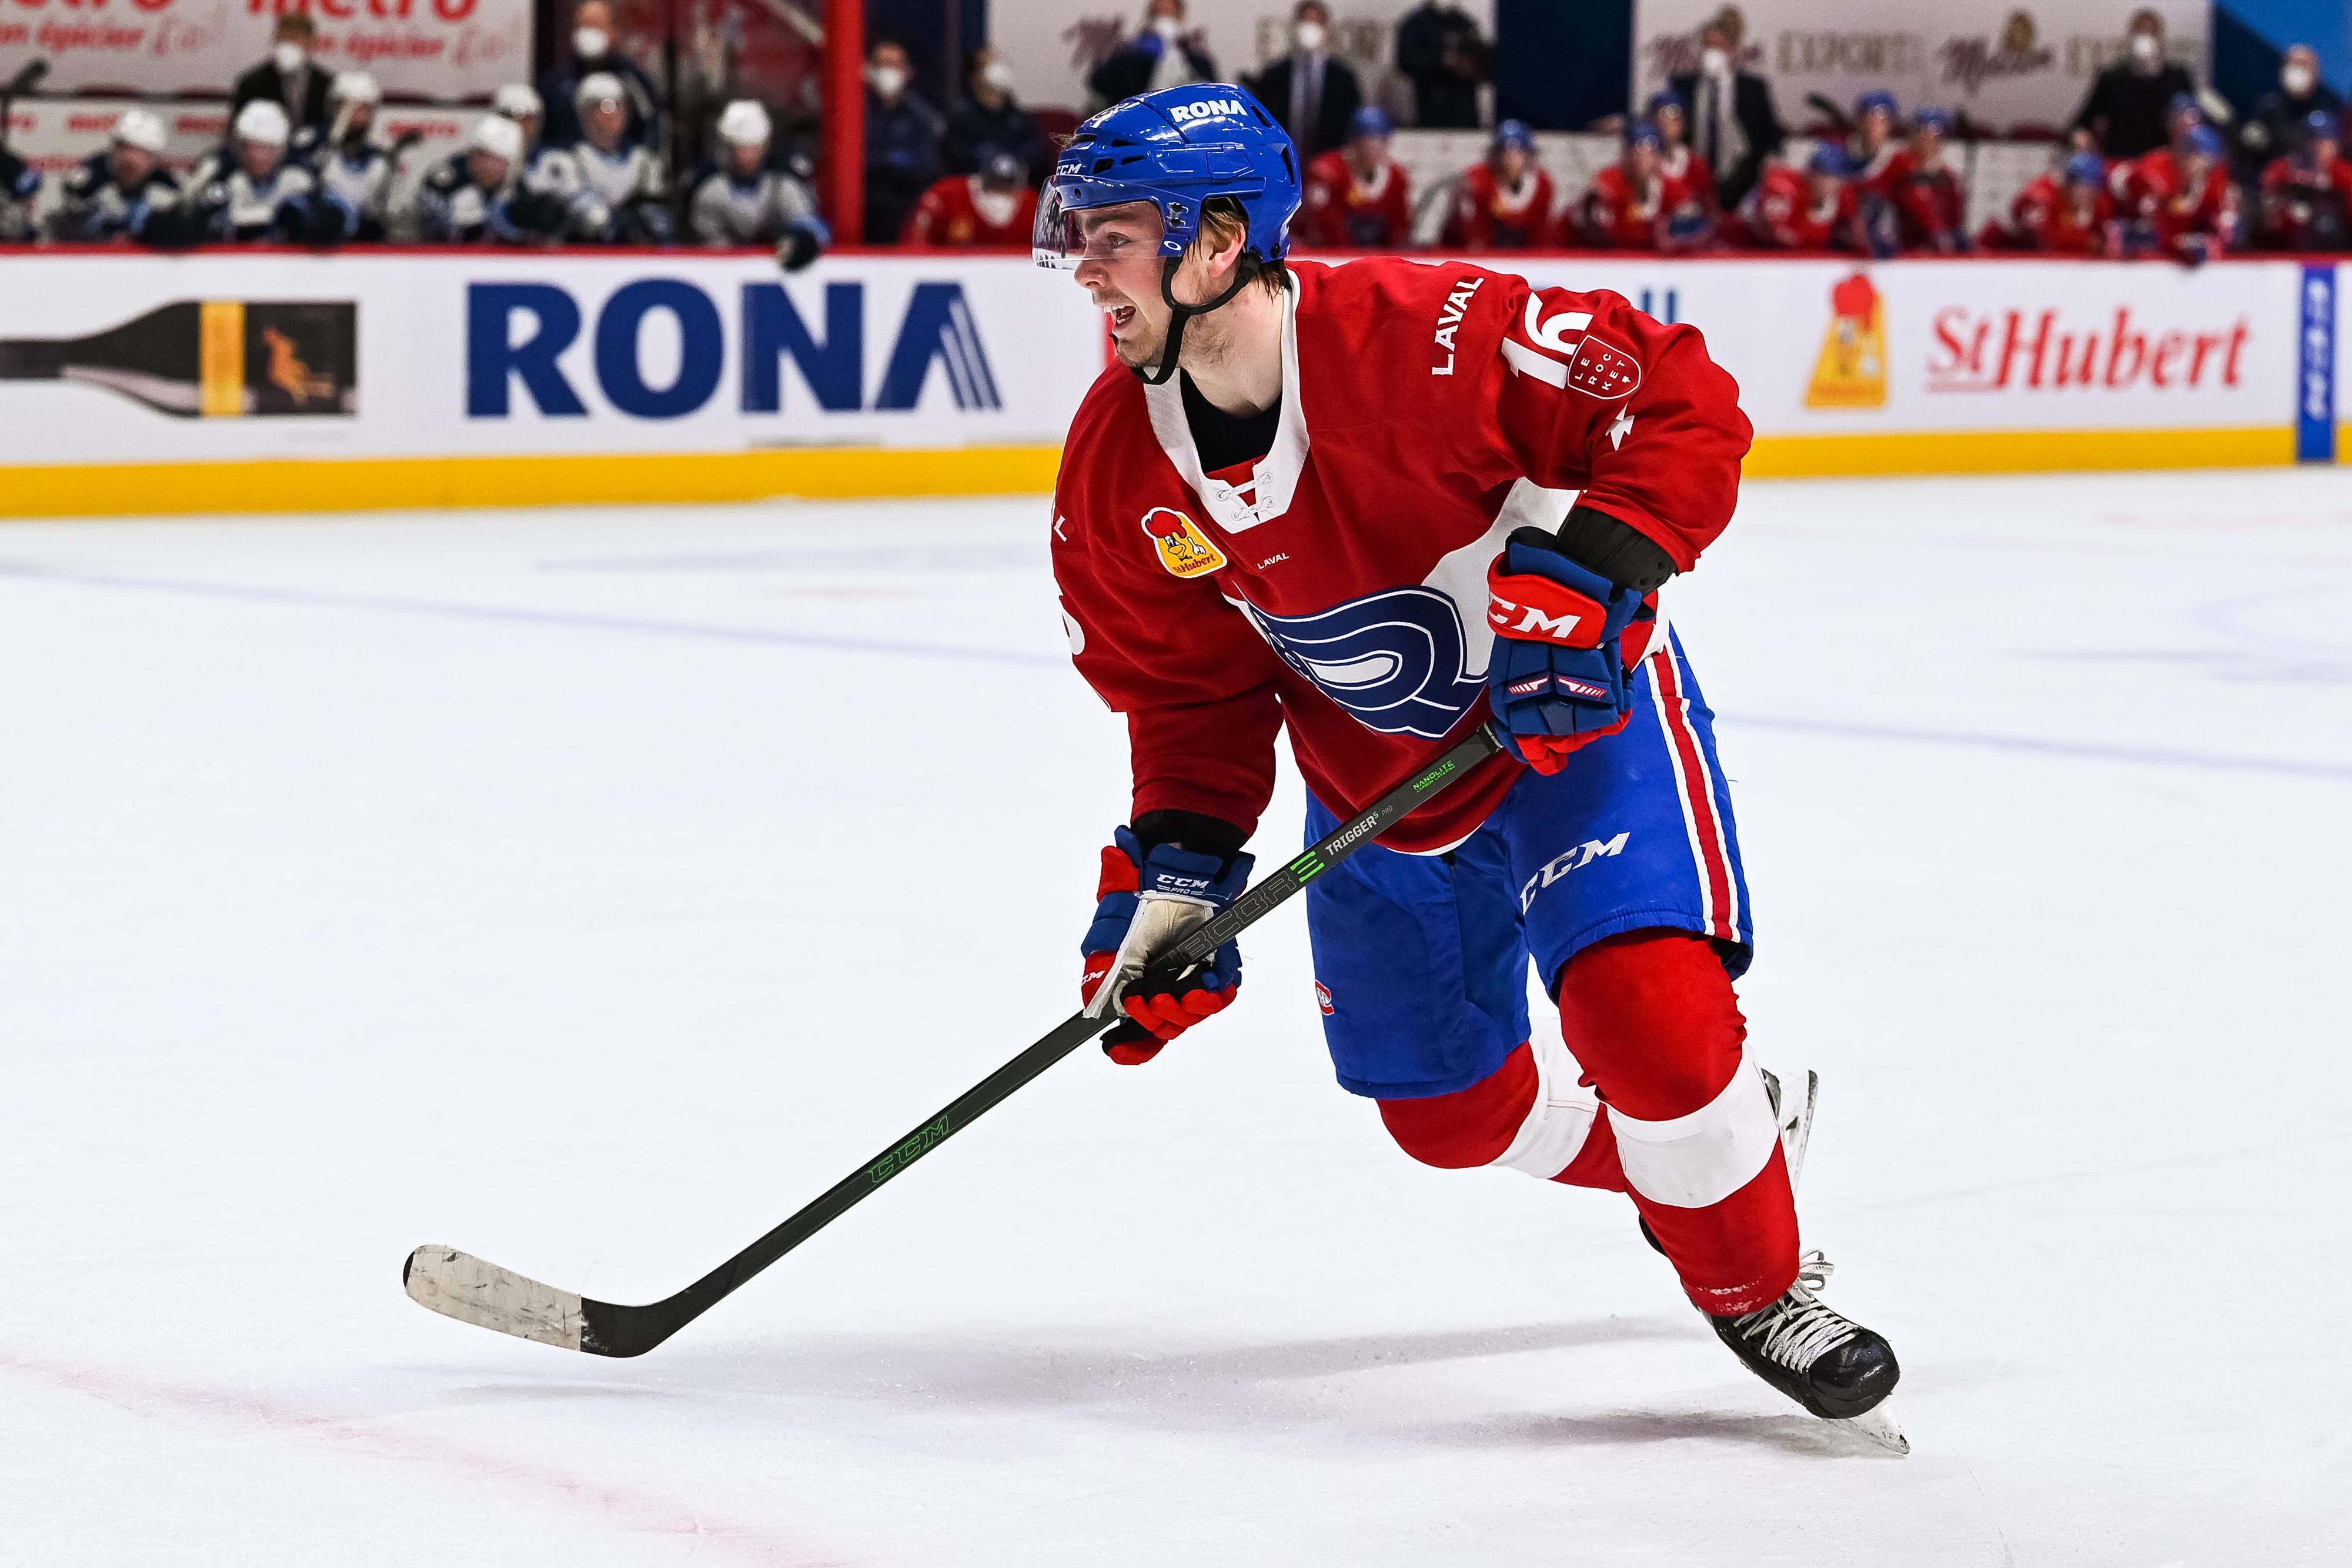 AHL: FEB 22 Manitoba Moose at Laval Rocket